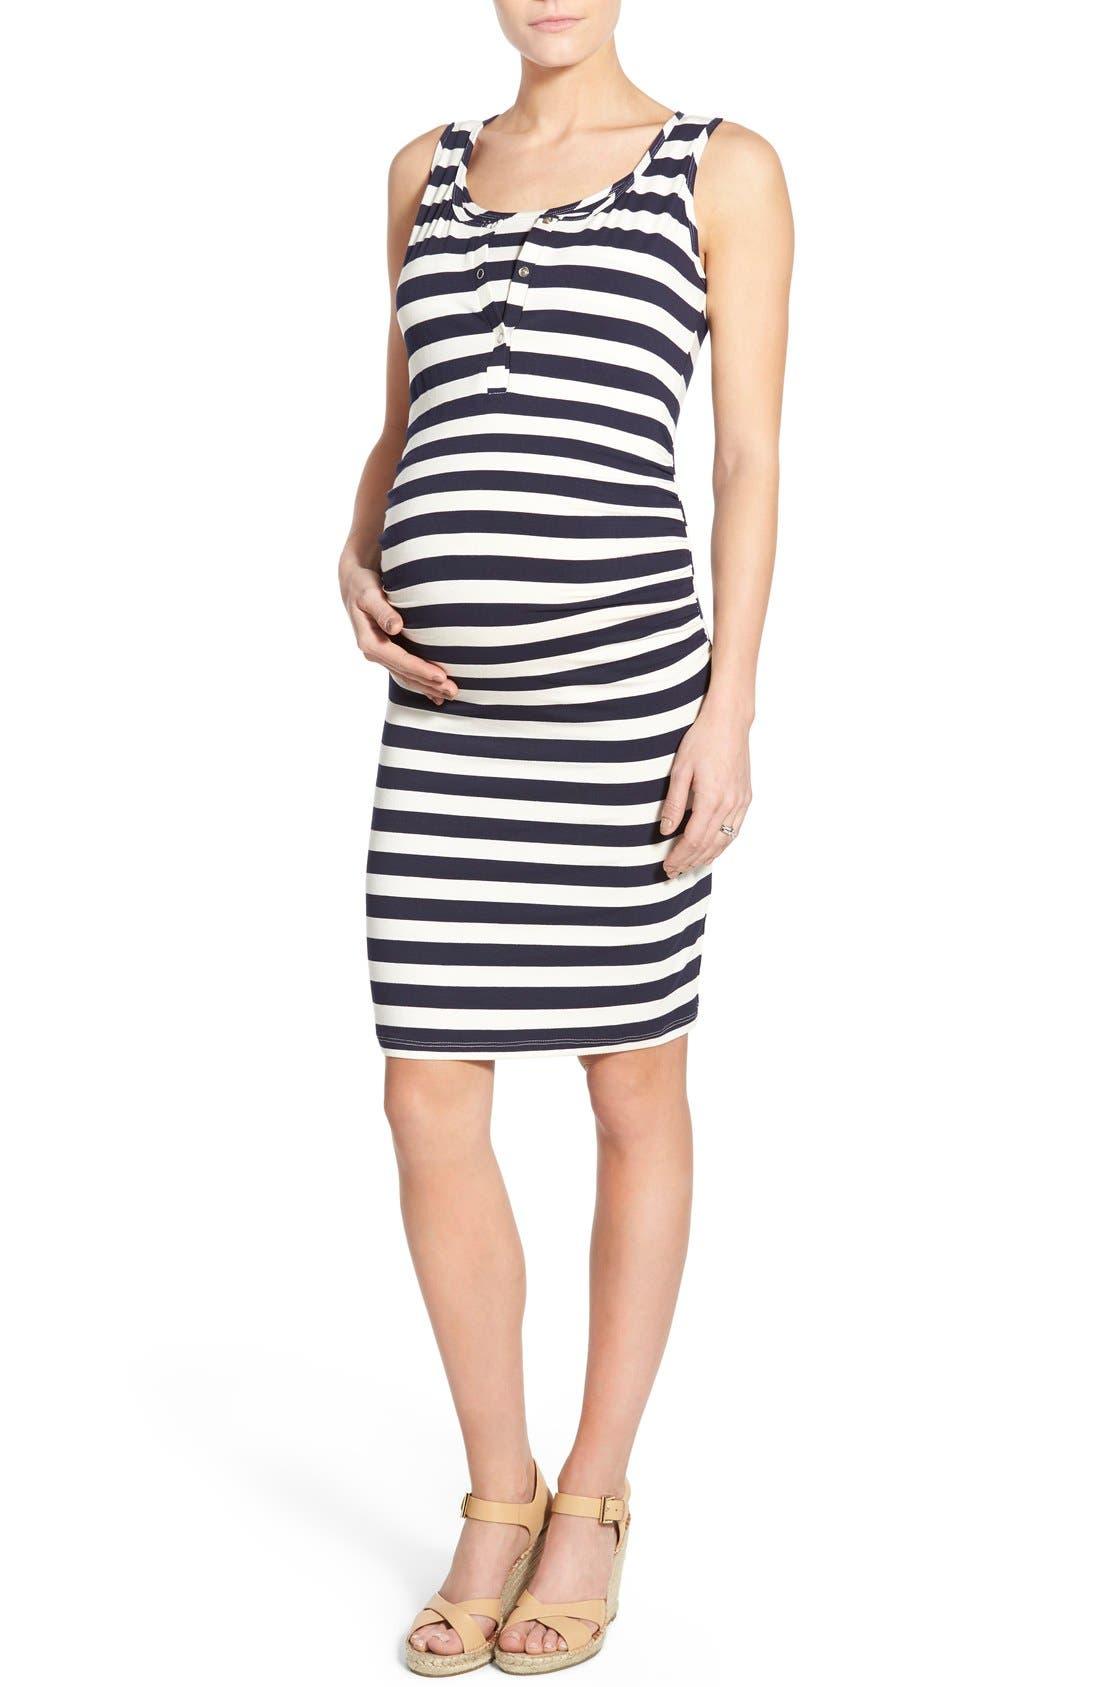 Main Image - LAB40 'Joy' Sleeveless Maternity/Nursing Midi Dress